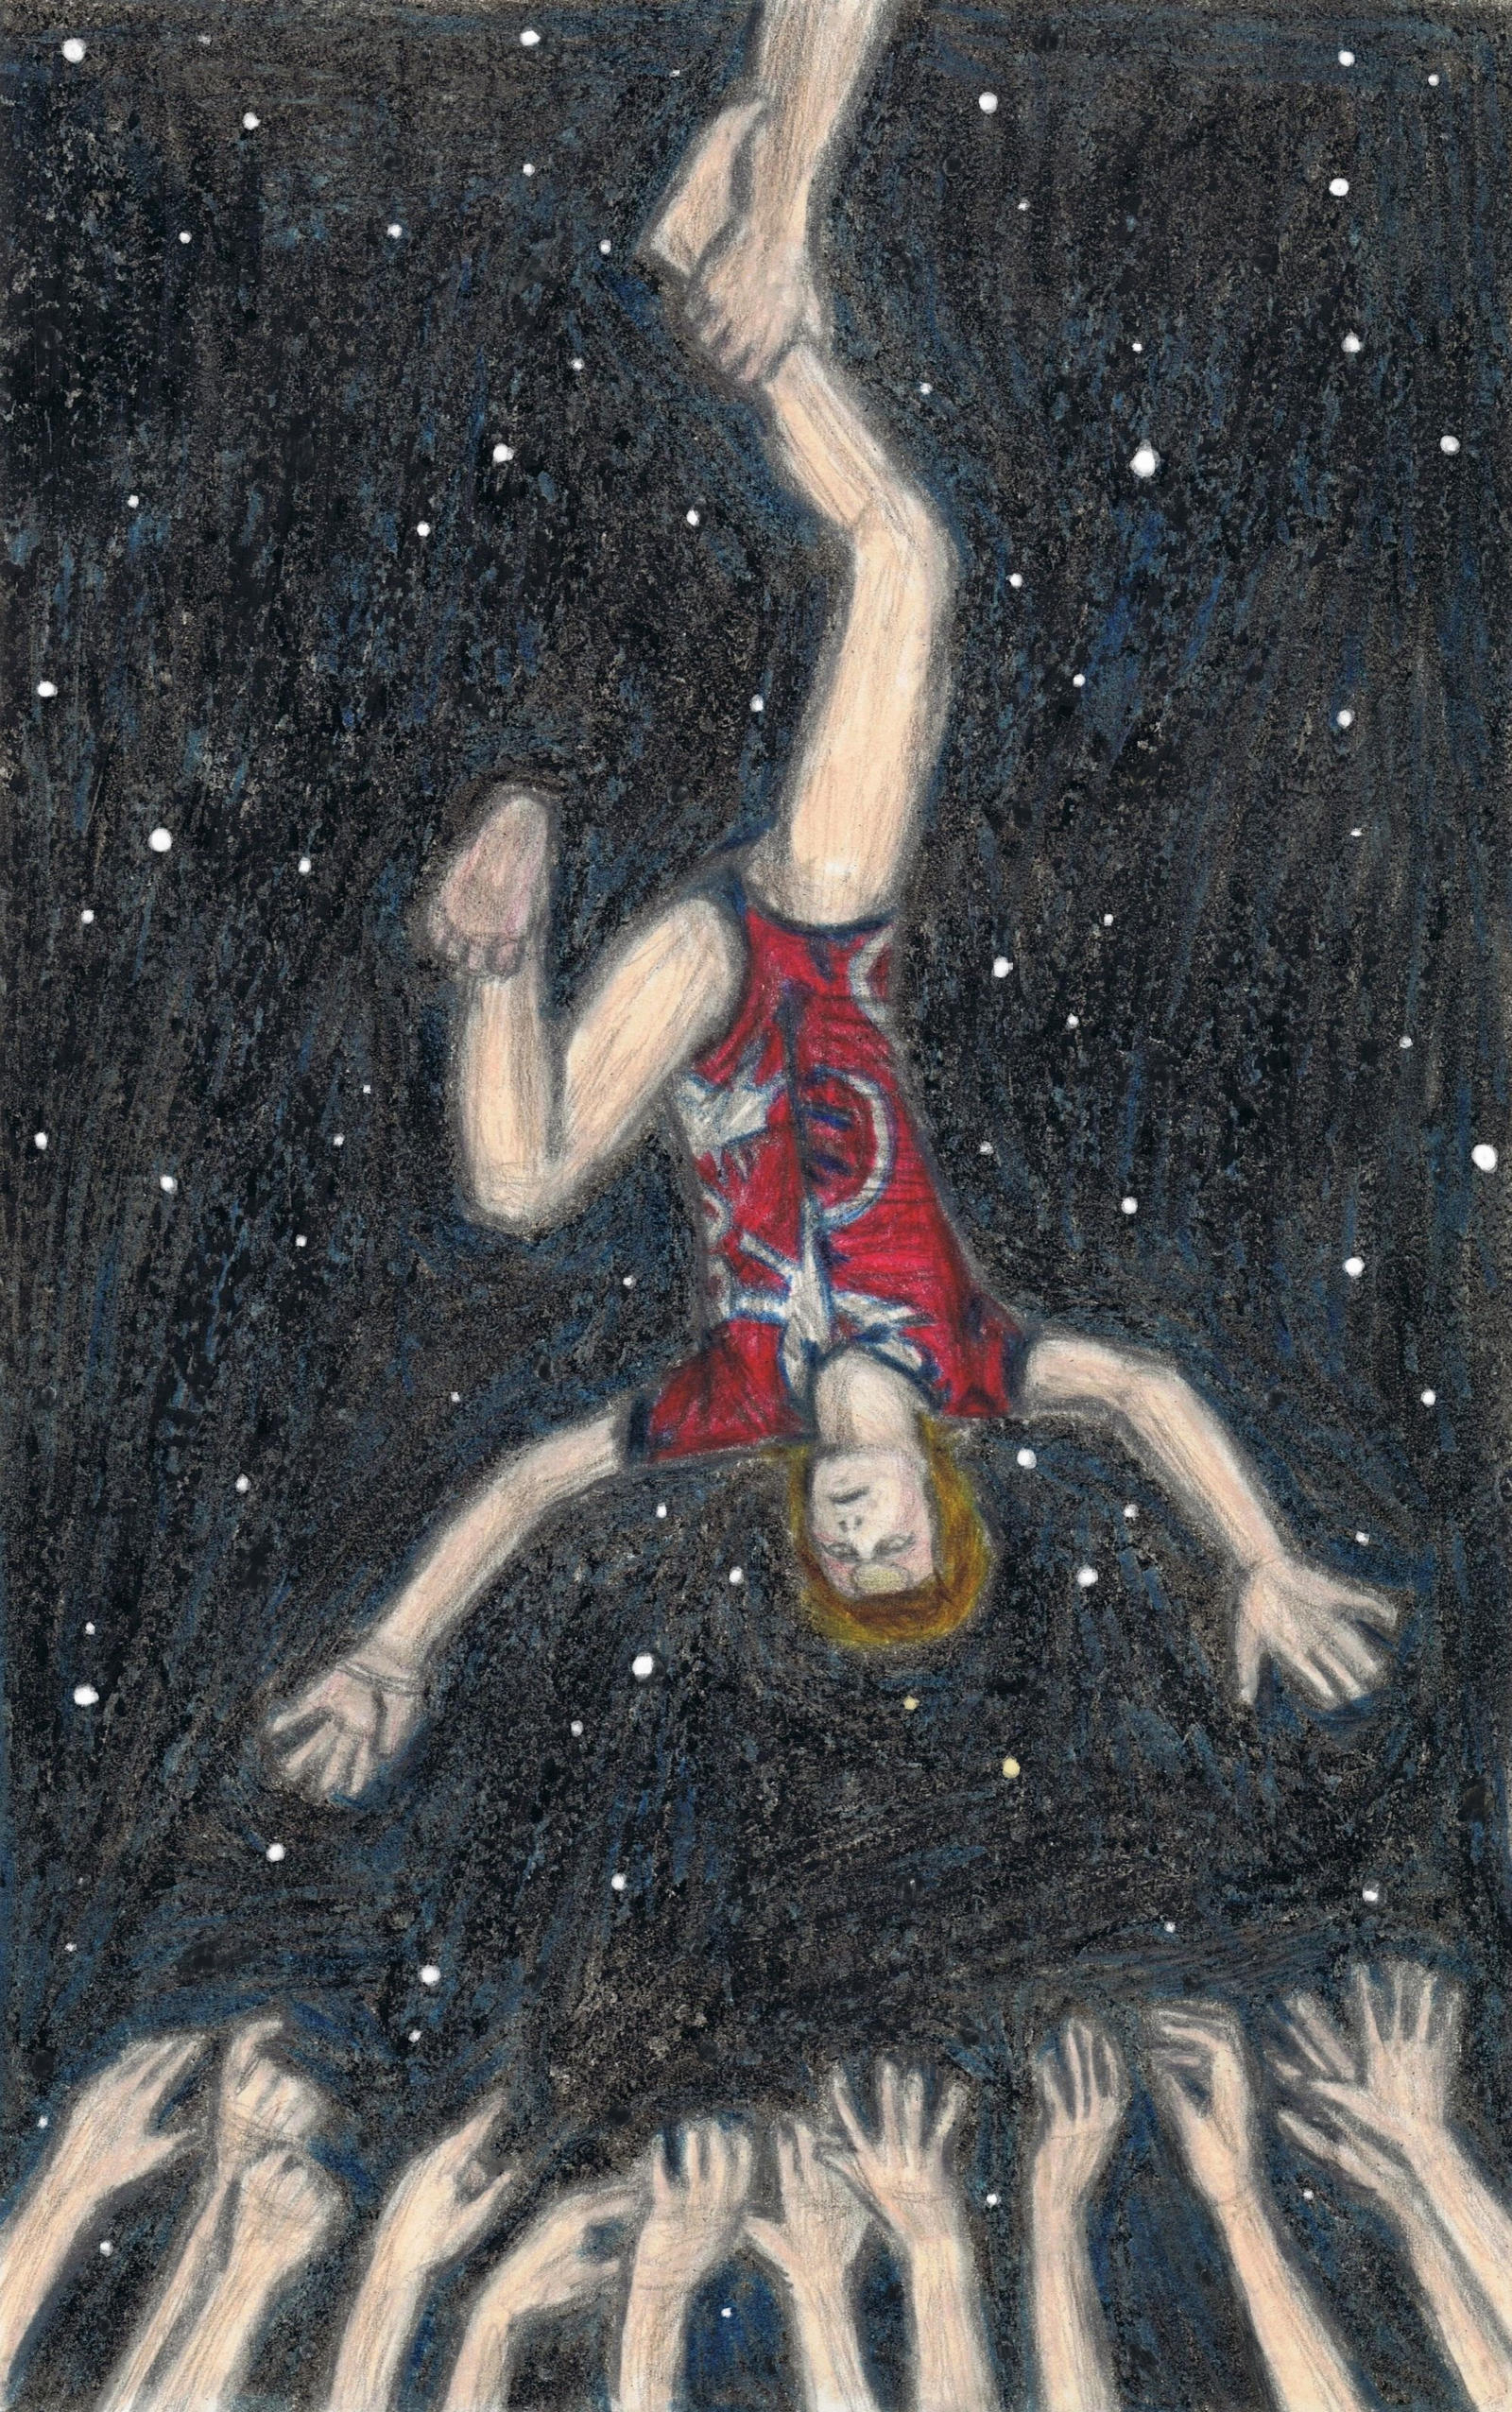 Ziggy Stardust upside down by gagambo